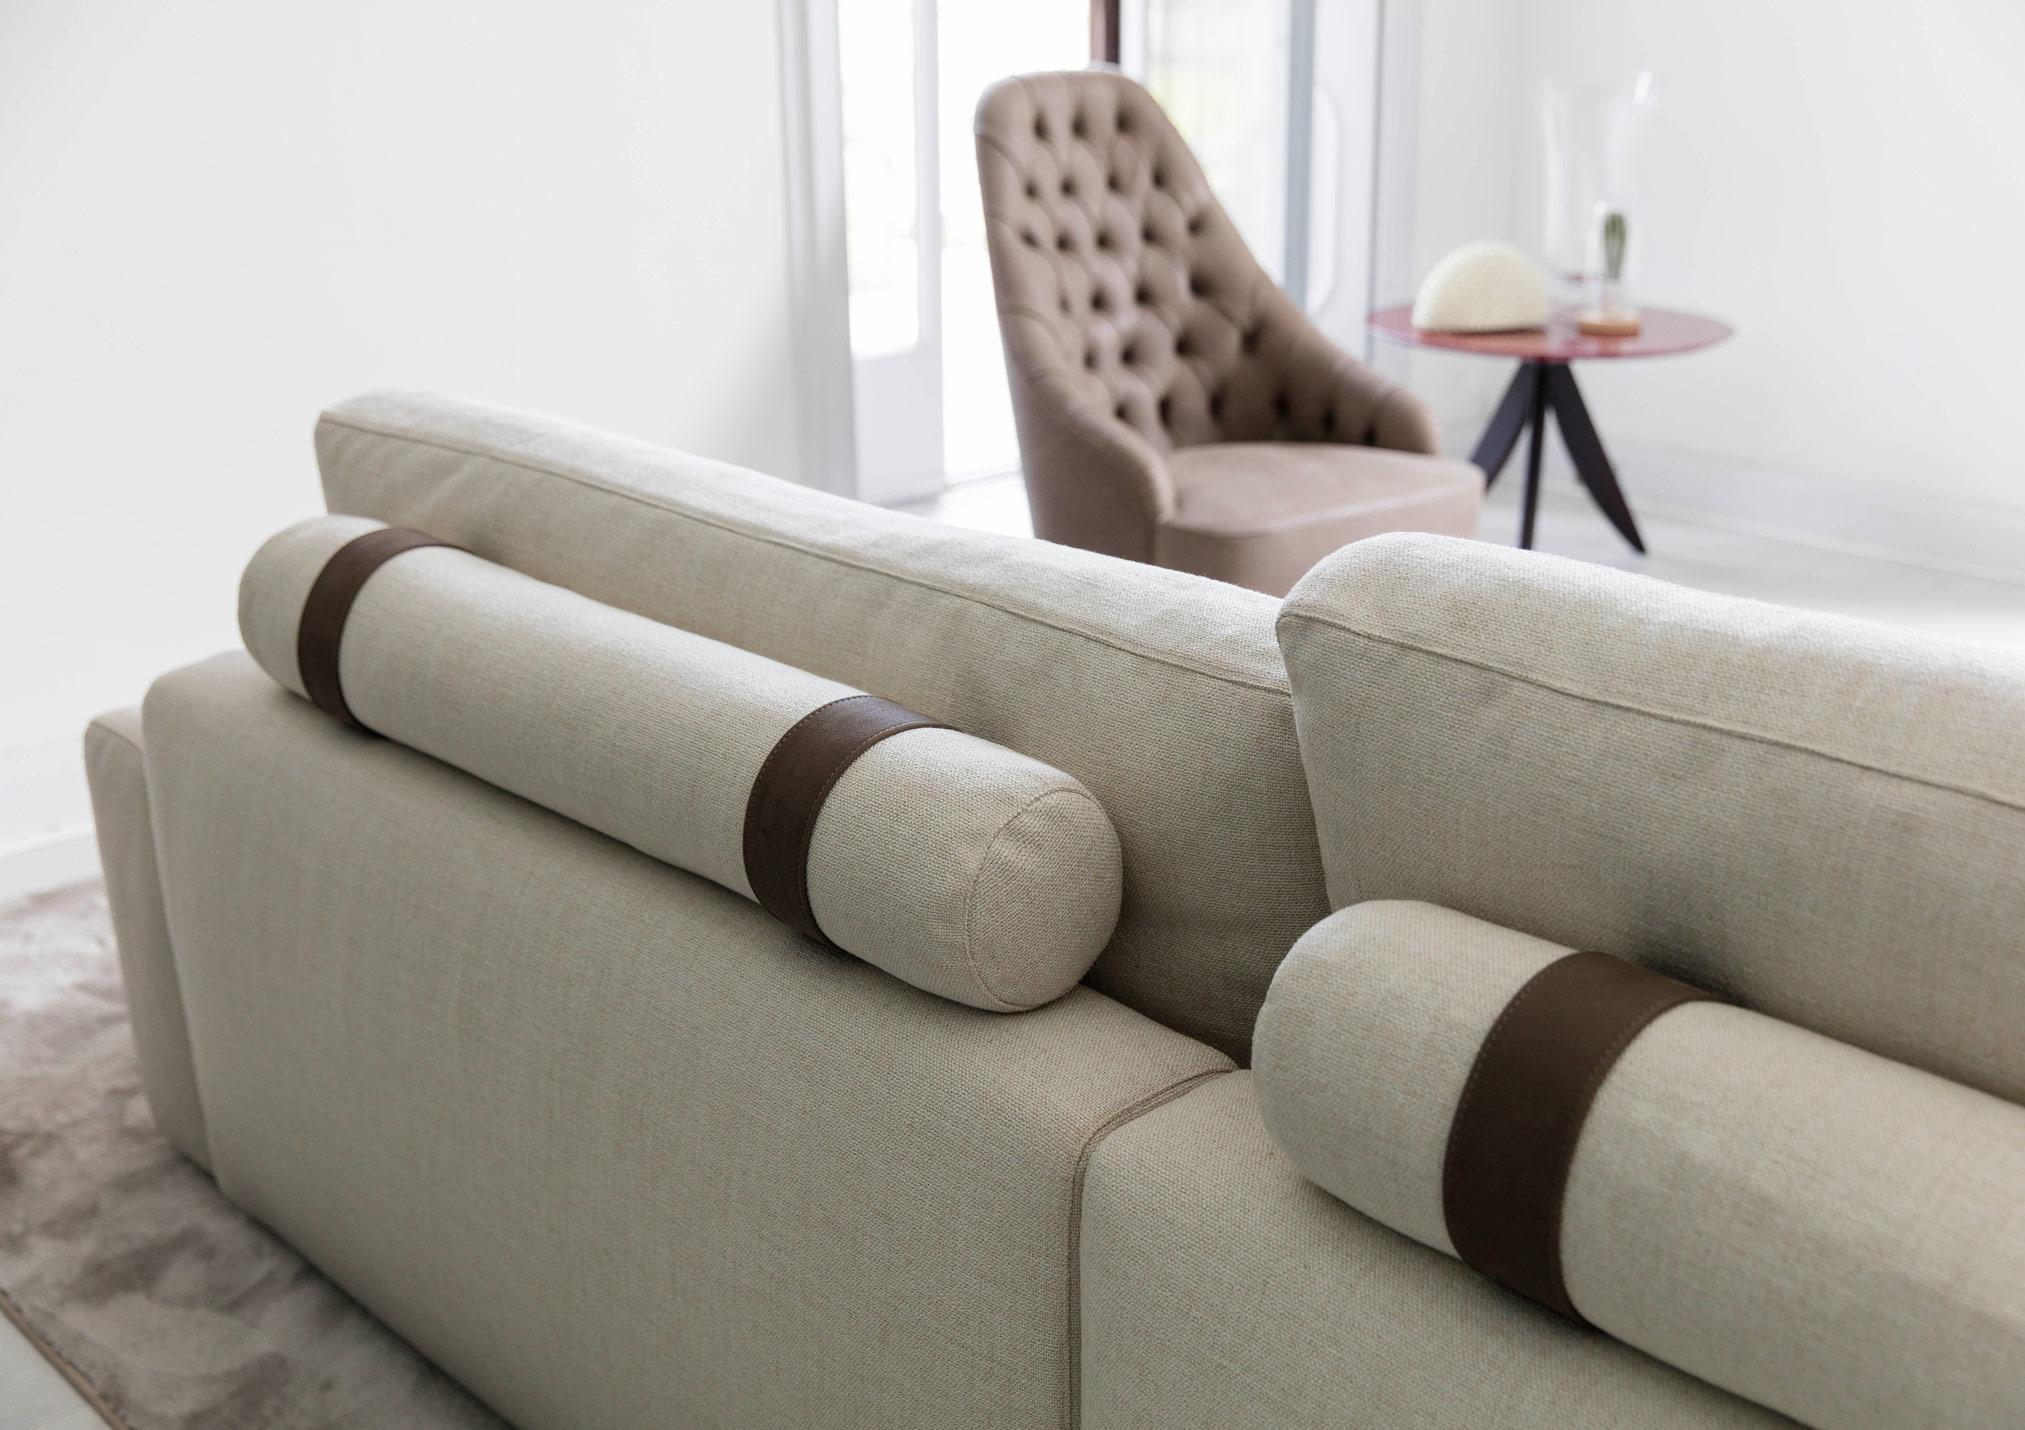 Joey sofa with low and high seatbacks